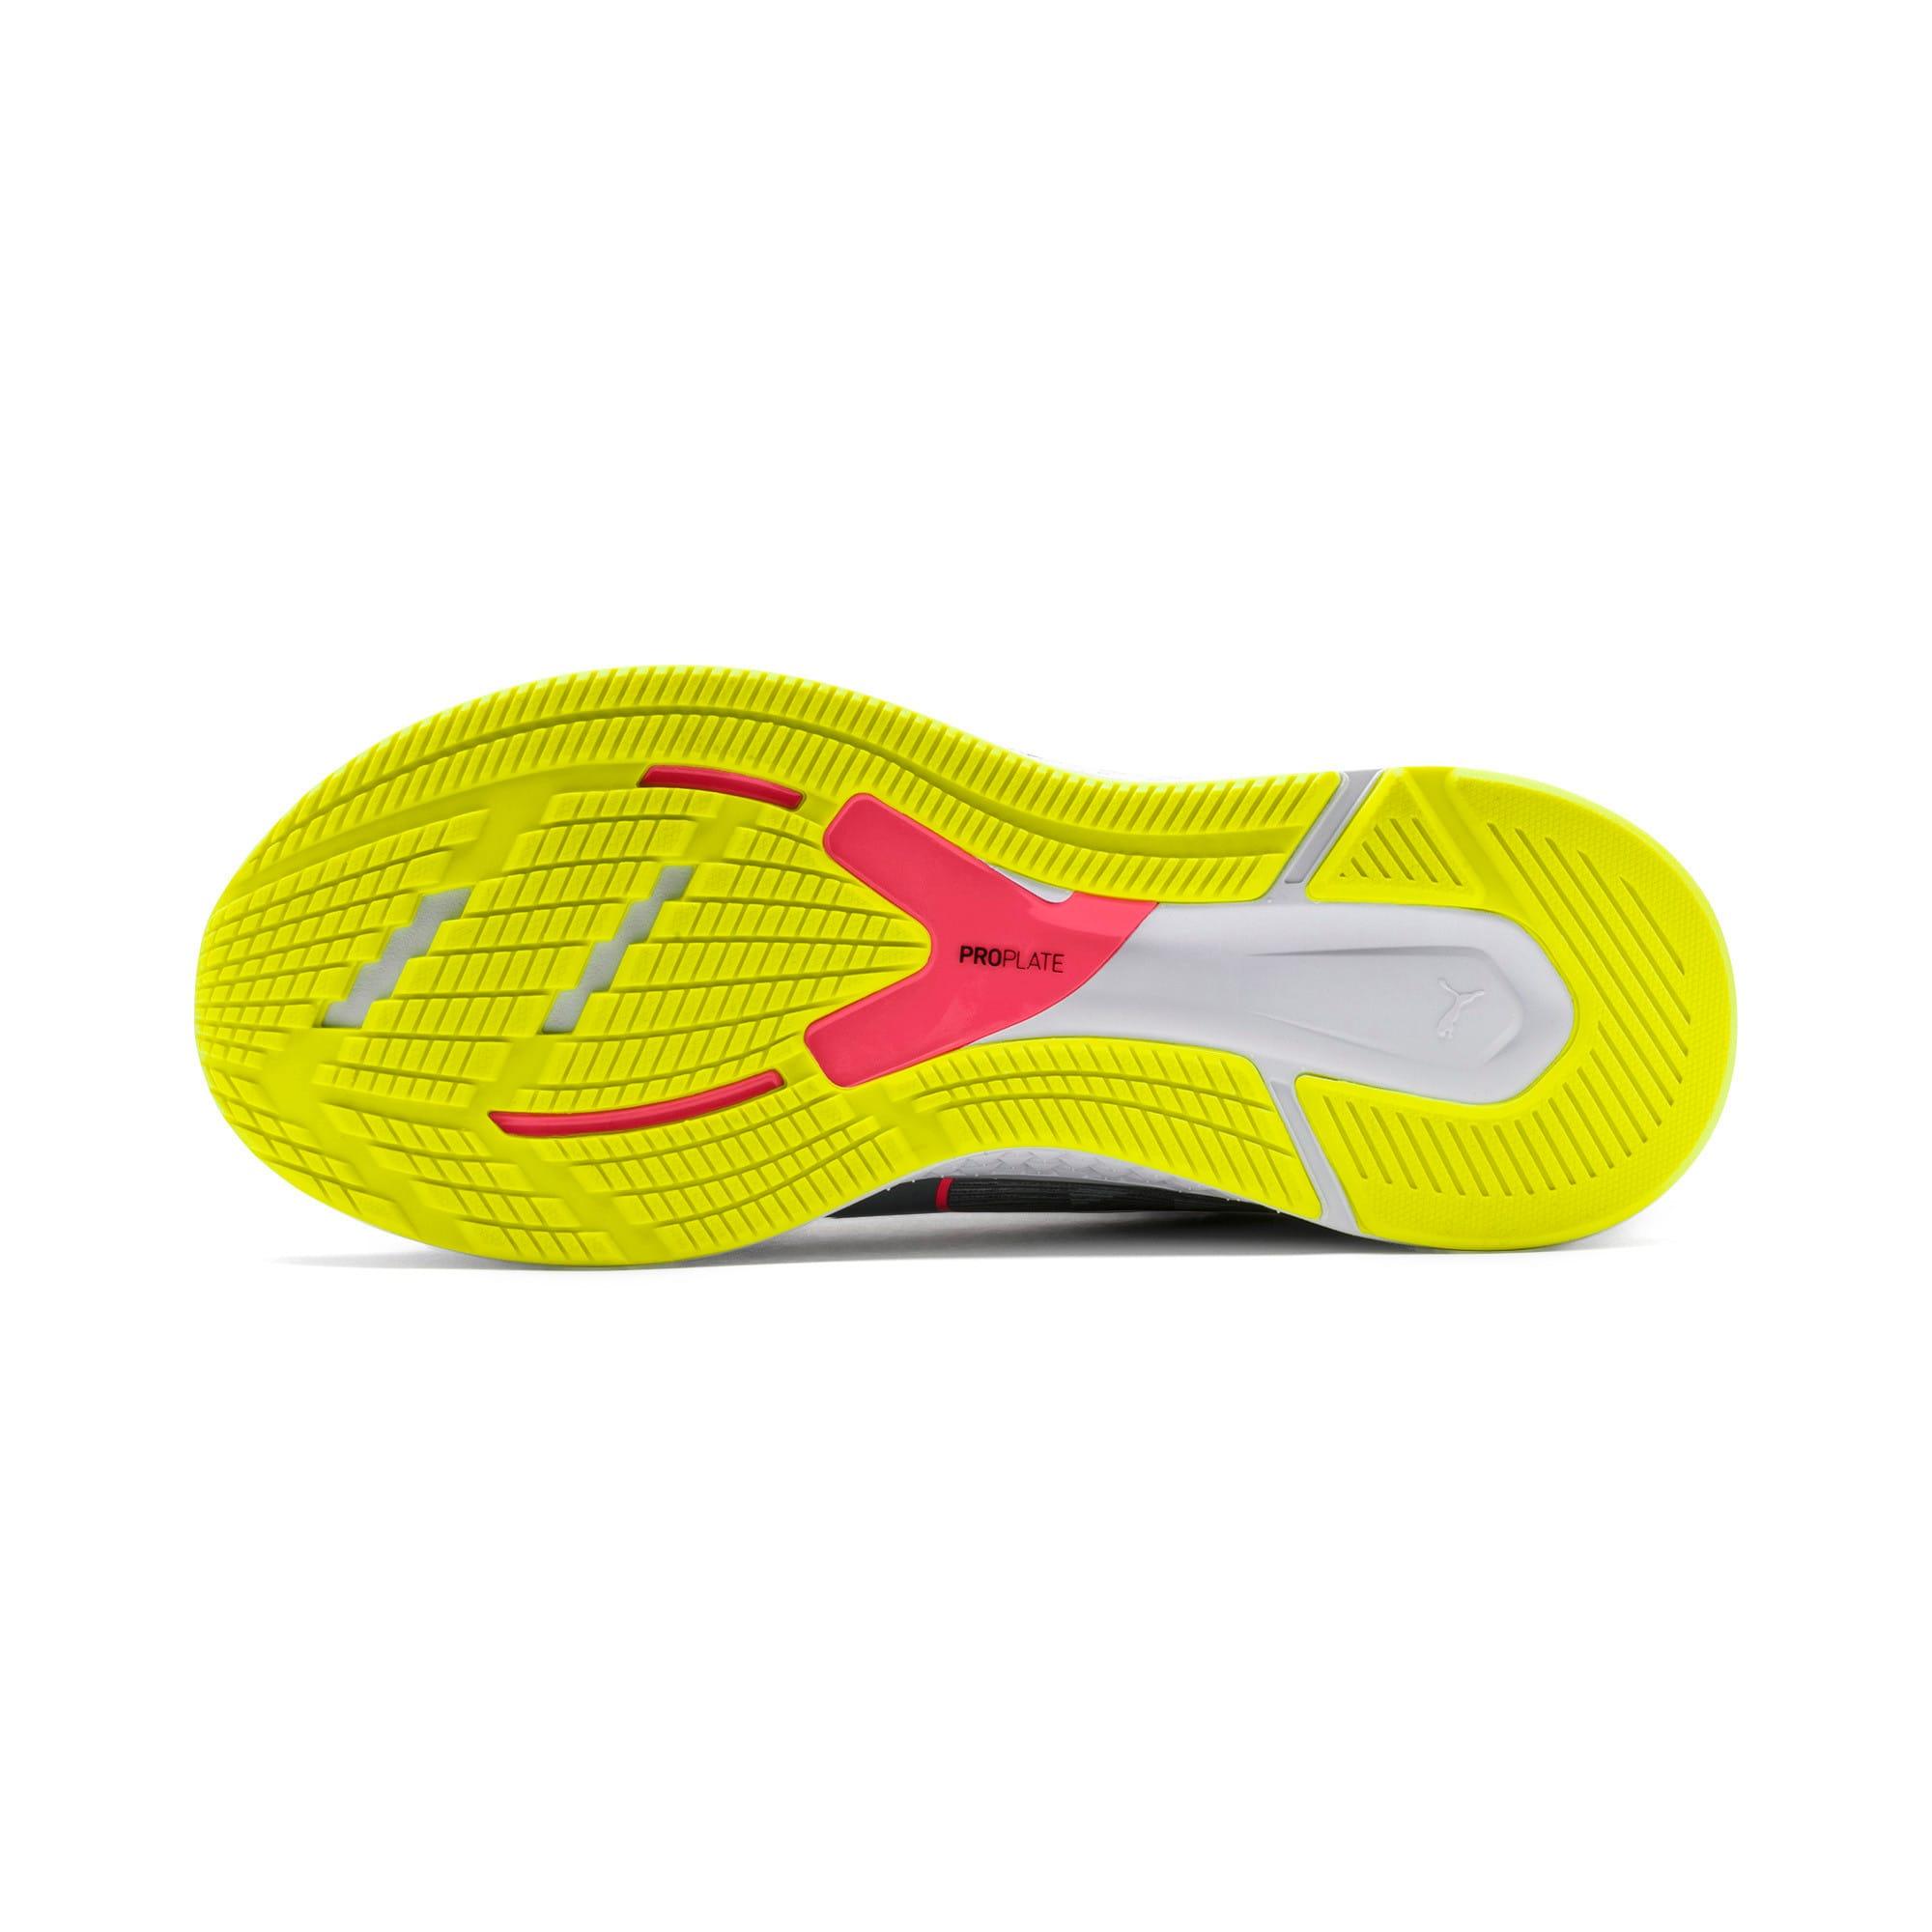 Thumbnail 8 of Speed Sutamina Women's Running Shoes, Quarry-Yellow Alert-Pink, medium-IND